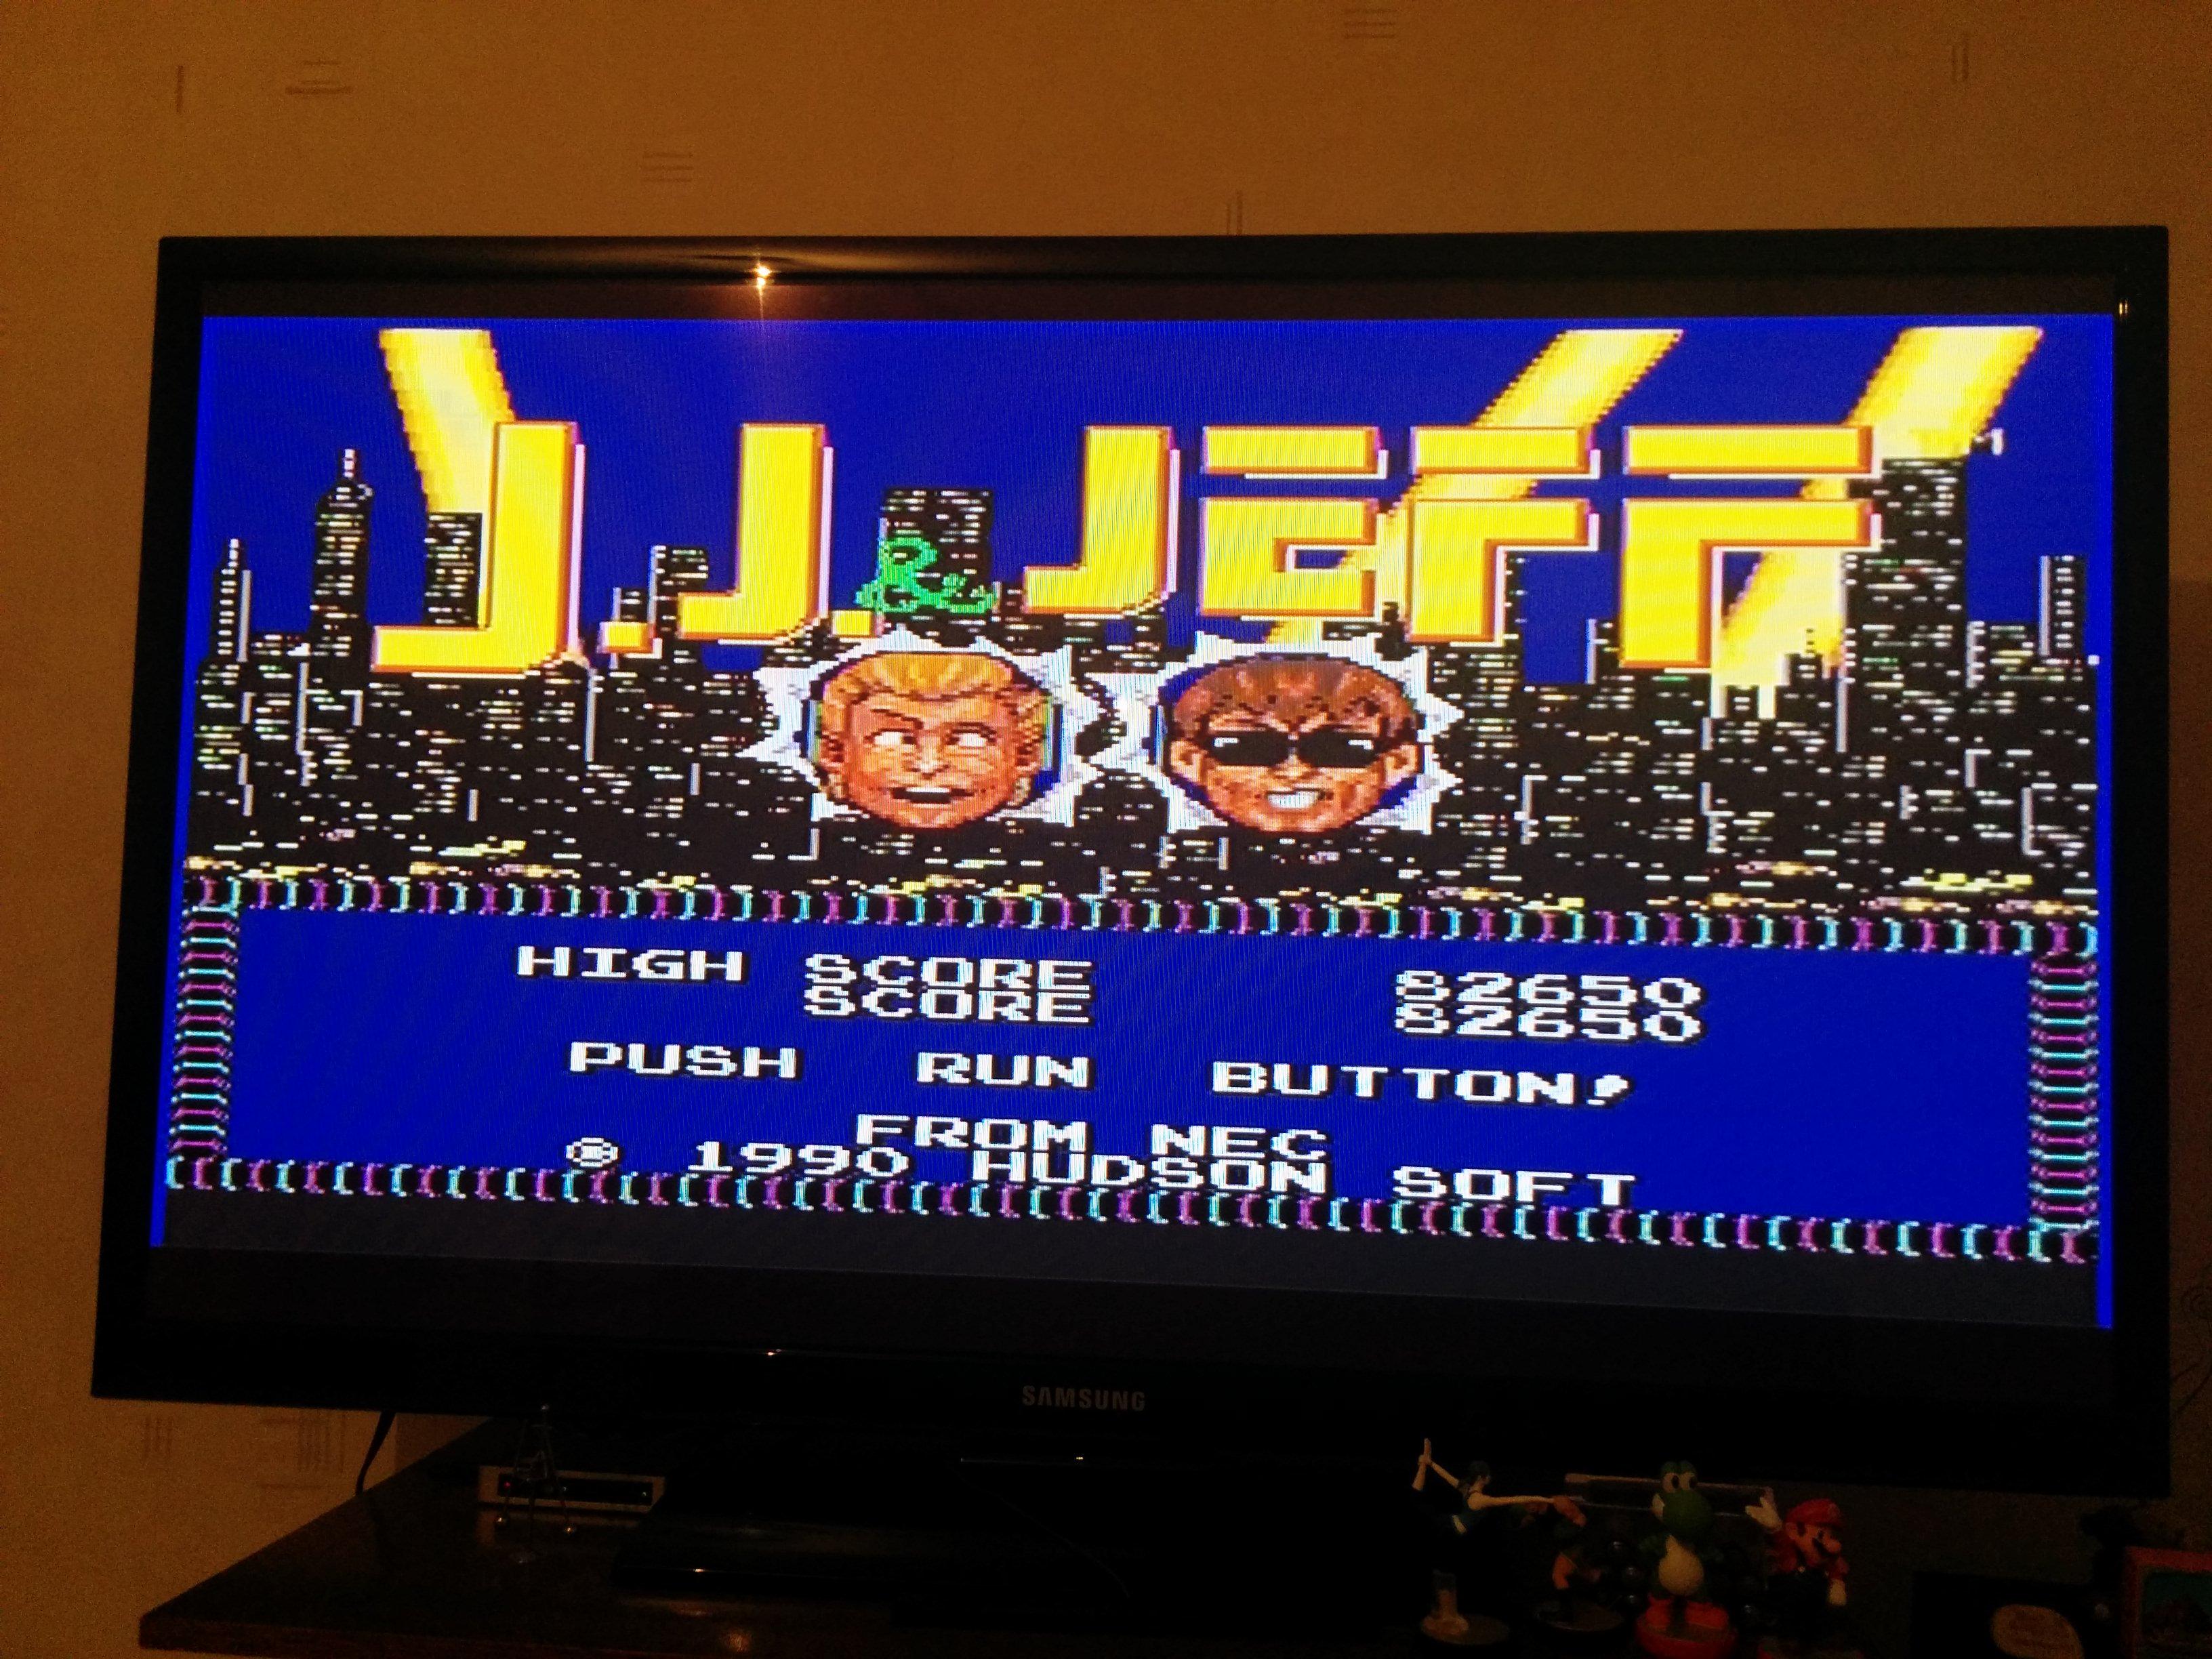 Mantalow: J.J. & Jeff (TurboGrafx-16/PC Engine) 82,650 points on 2015-11-06 15:10:48